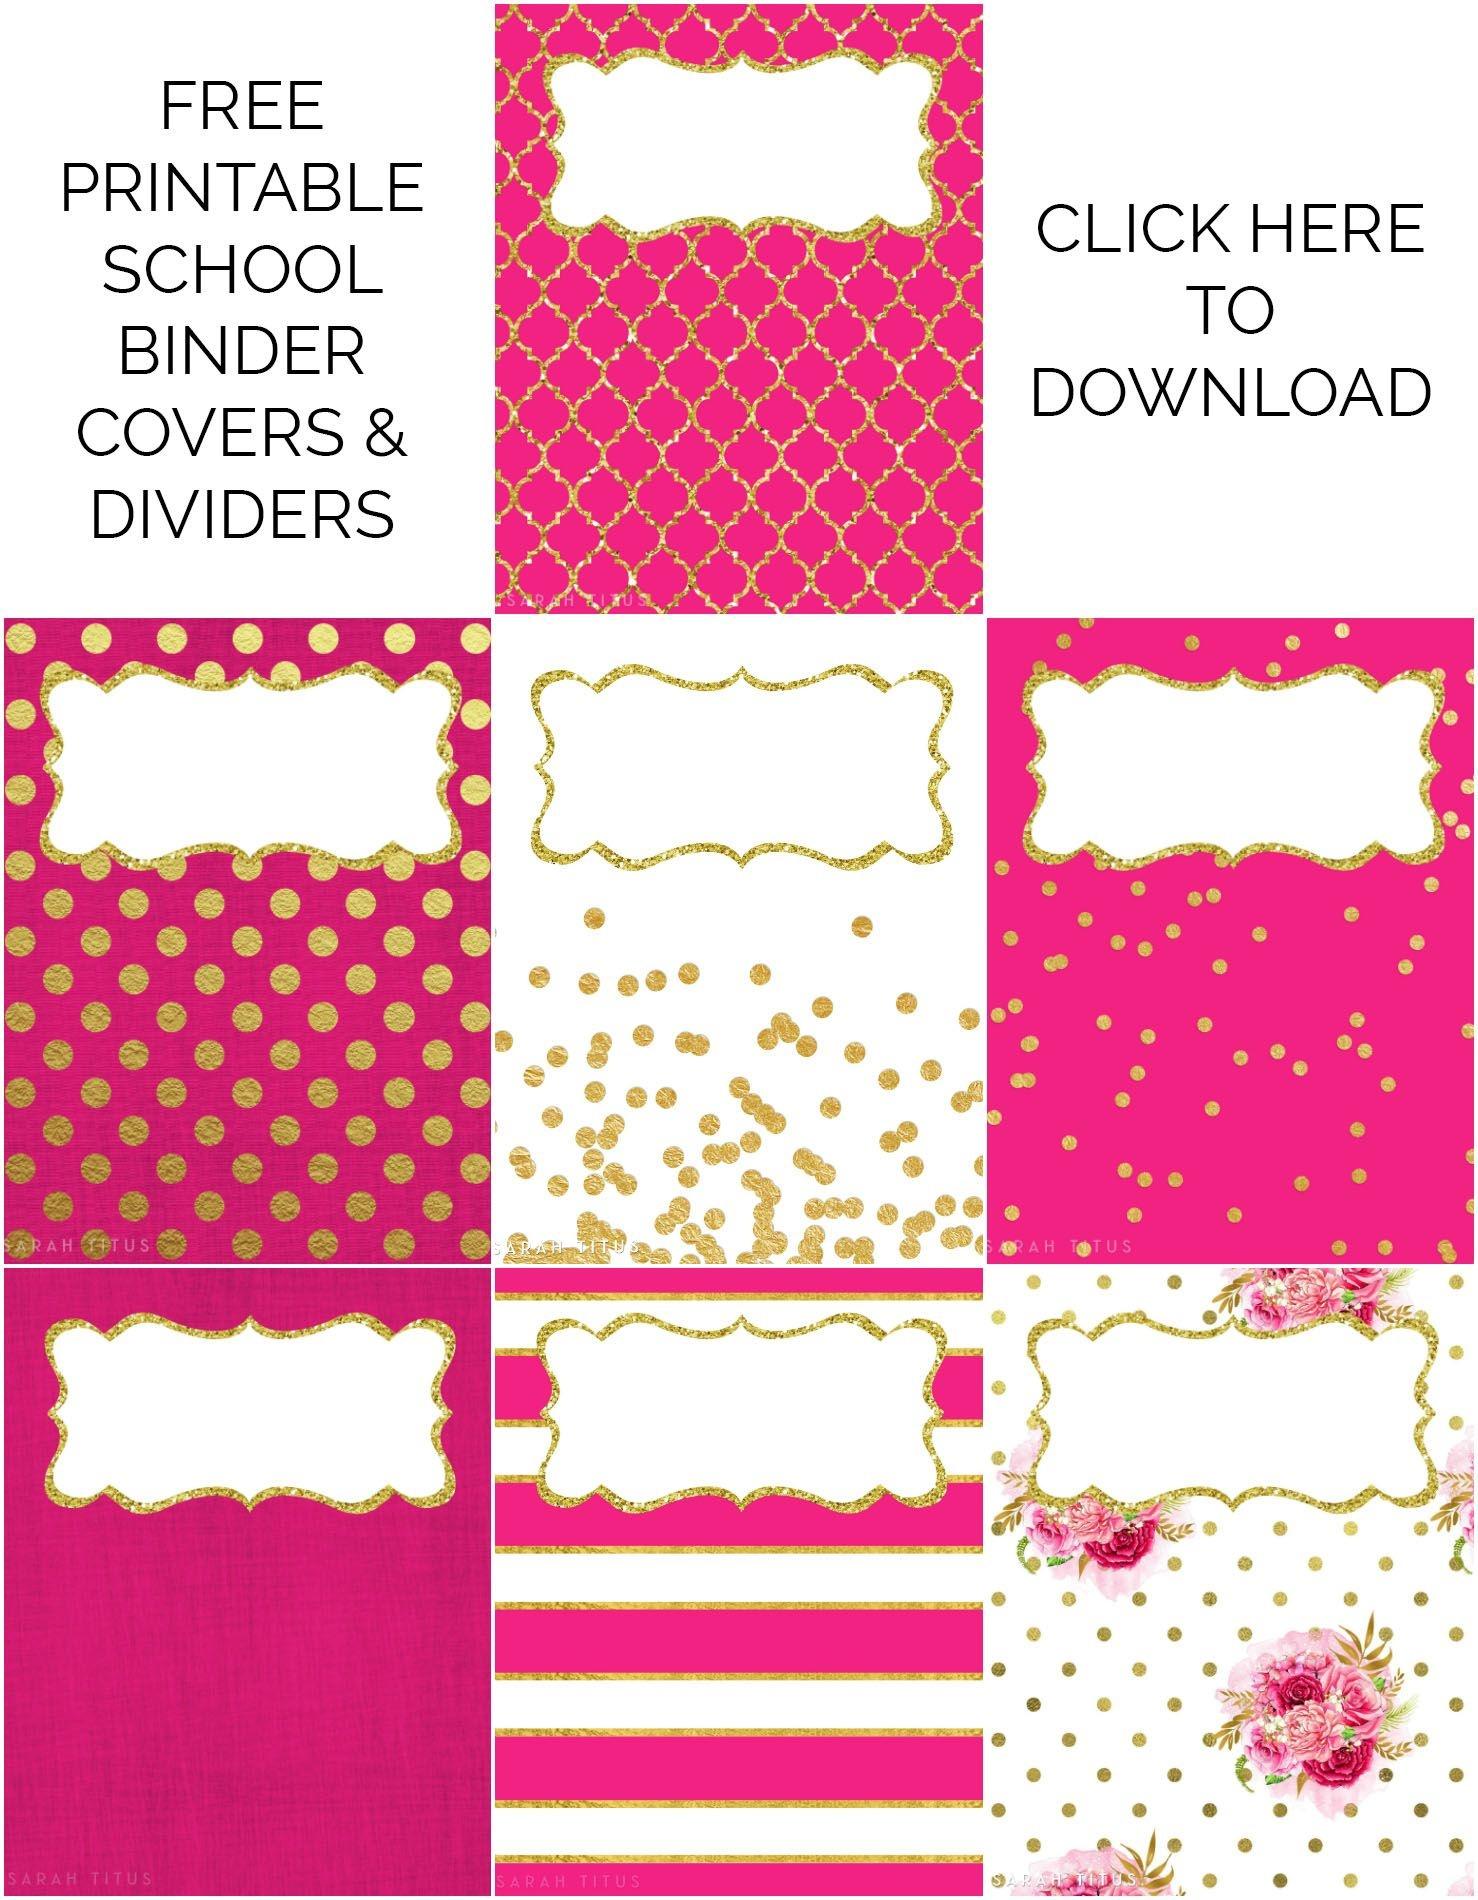 Binder Covers / Dividers Free Printables | Plans | Binder Covers - Free Printable Binder Covers